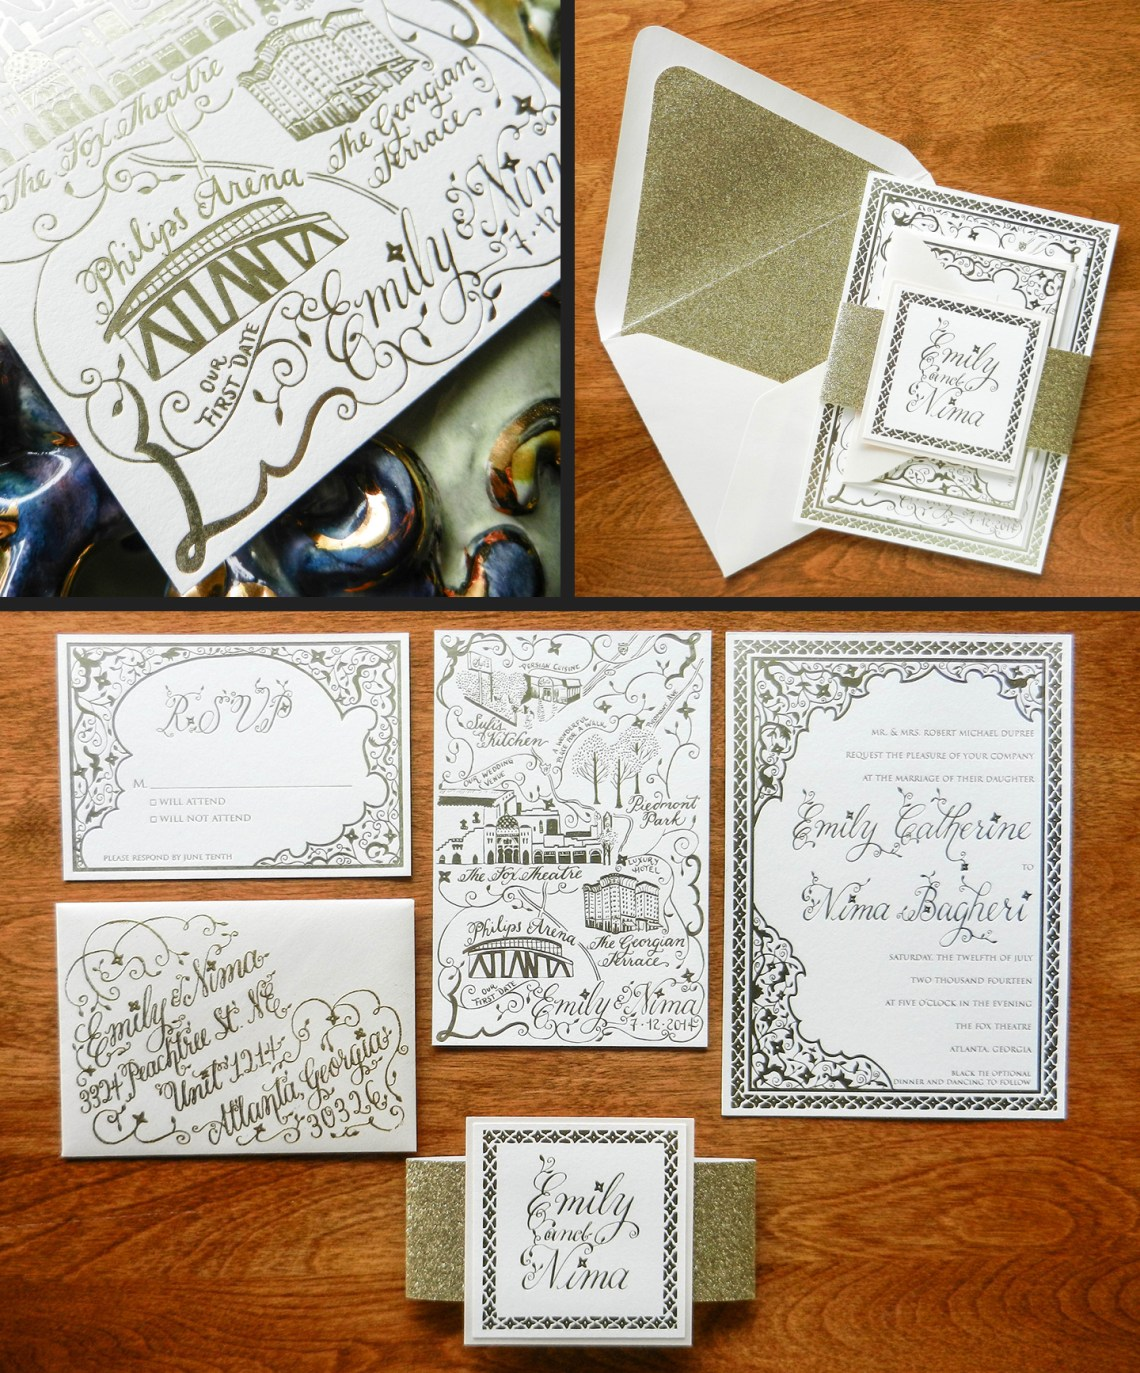 Gold Foil Flourish Formal Invitation Suite | The Postman's Knock